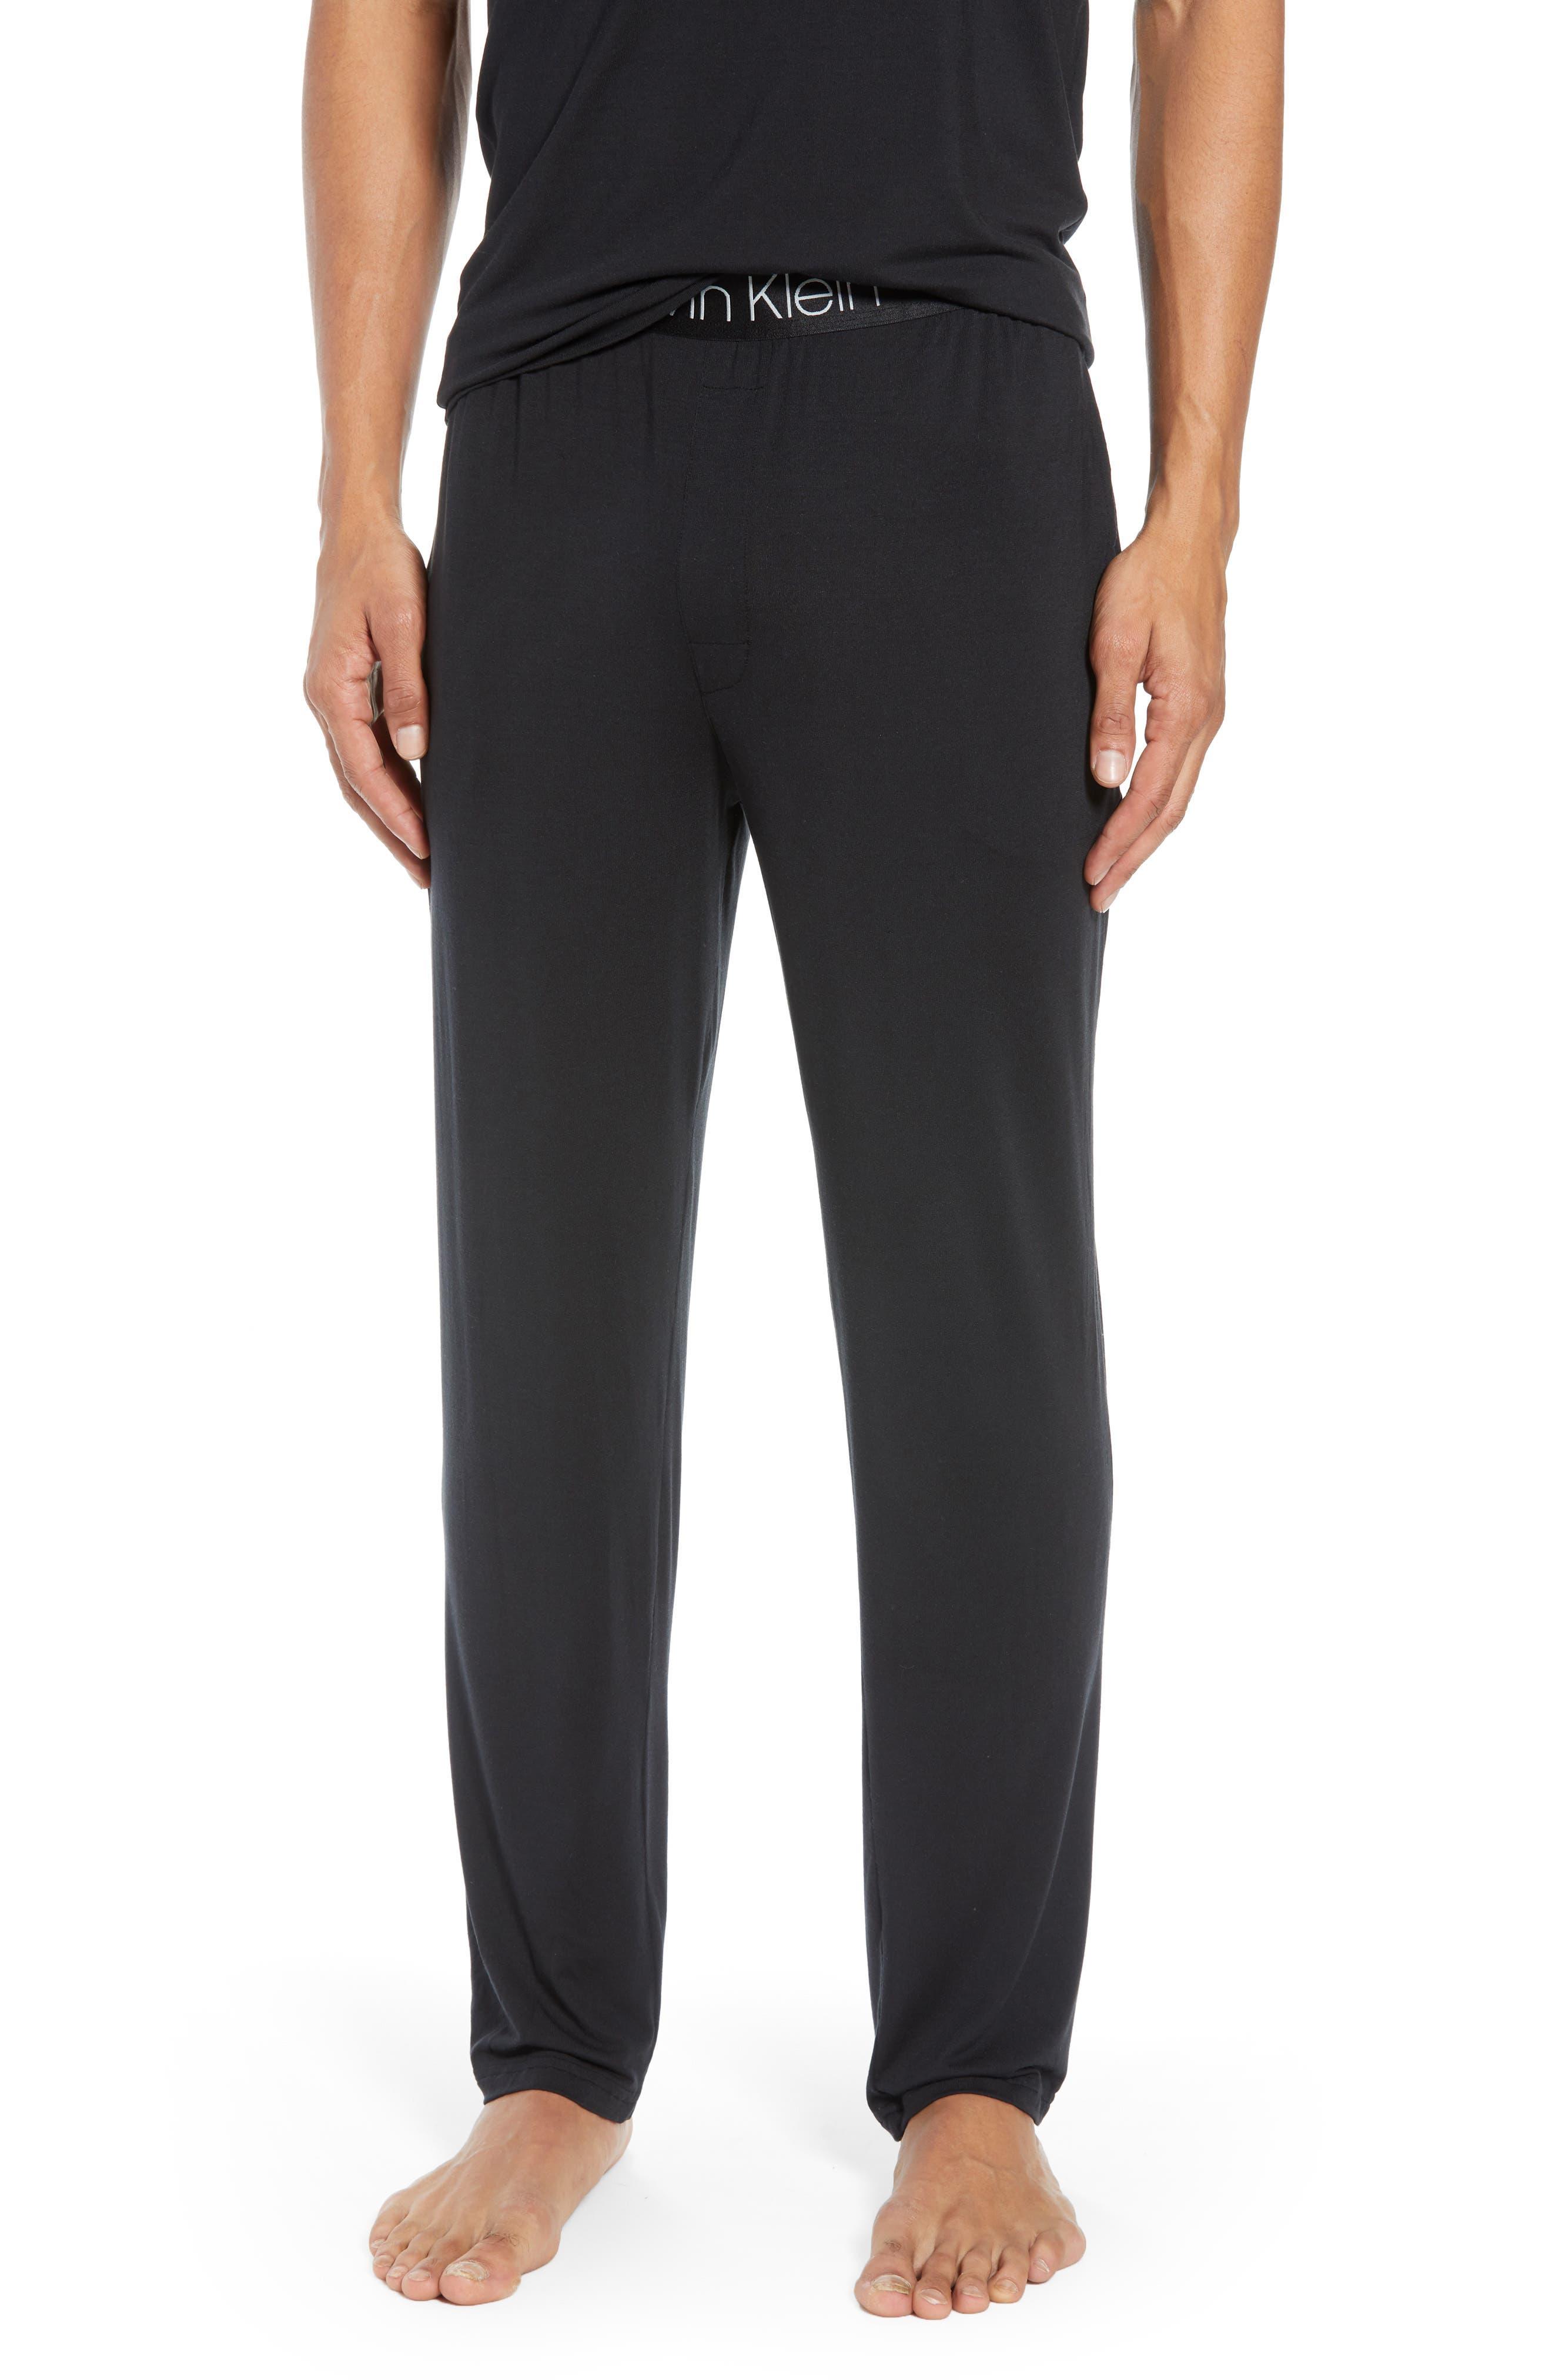 CALVIN KLEIN, Stretch Modal Lounge Pants, Main thumbnail 1, color, BLACK